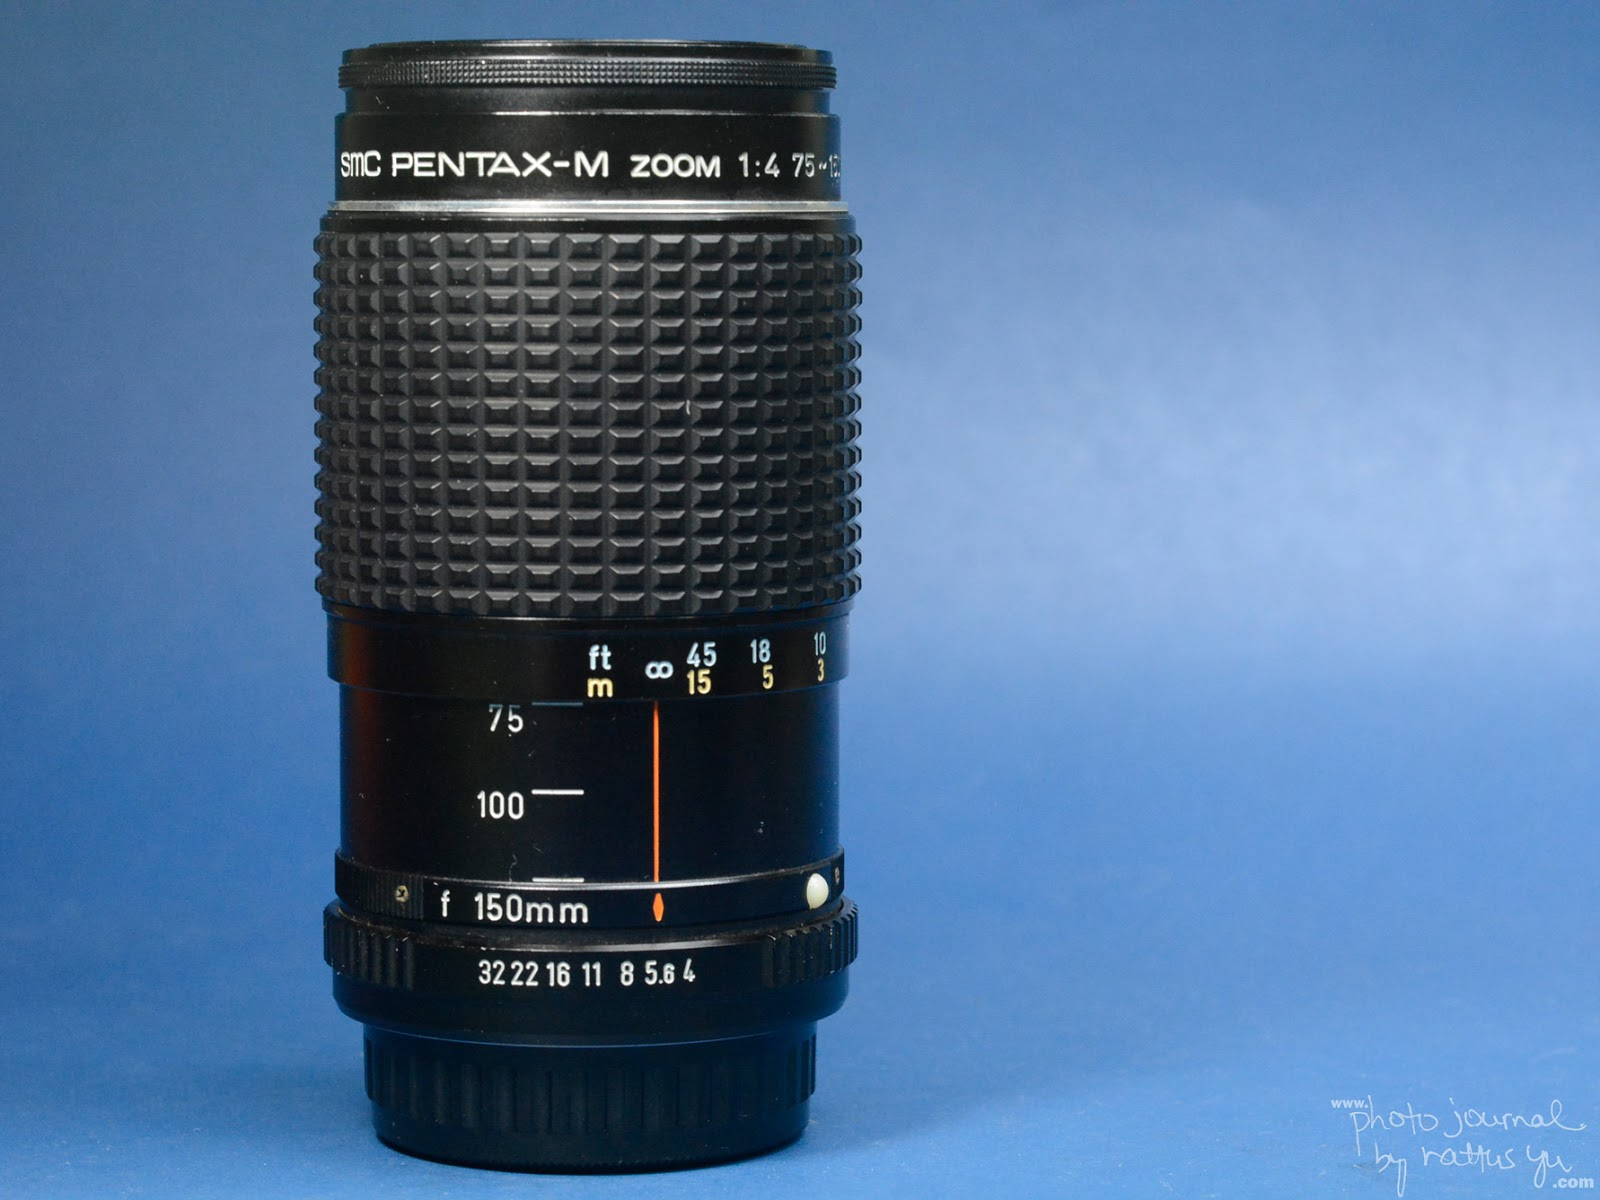 SMC Pentax-M 75-150mm f/4, Great Portrait Zoom Lens!